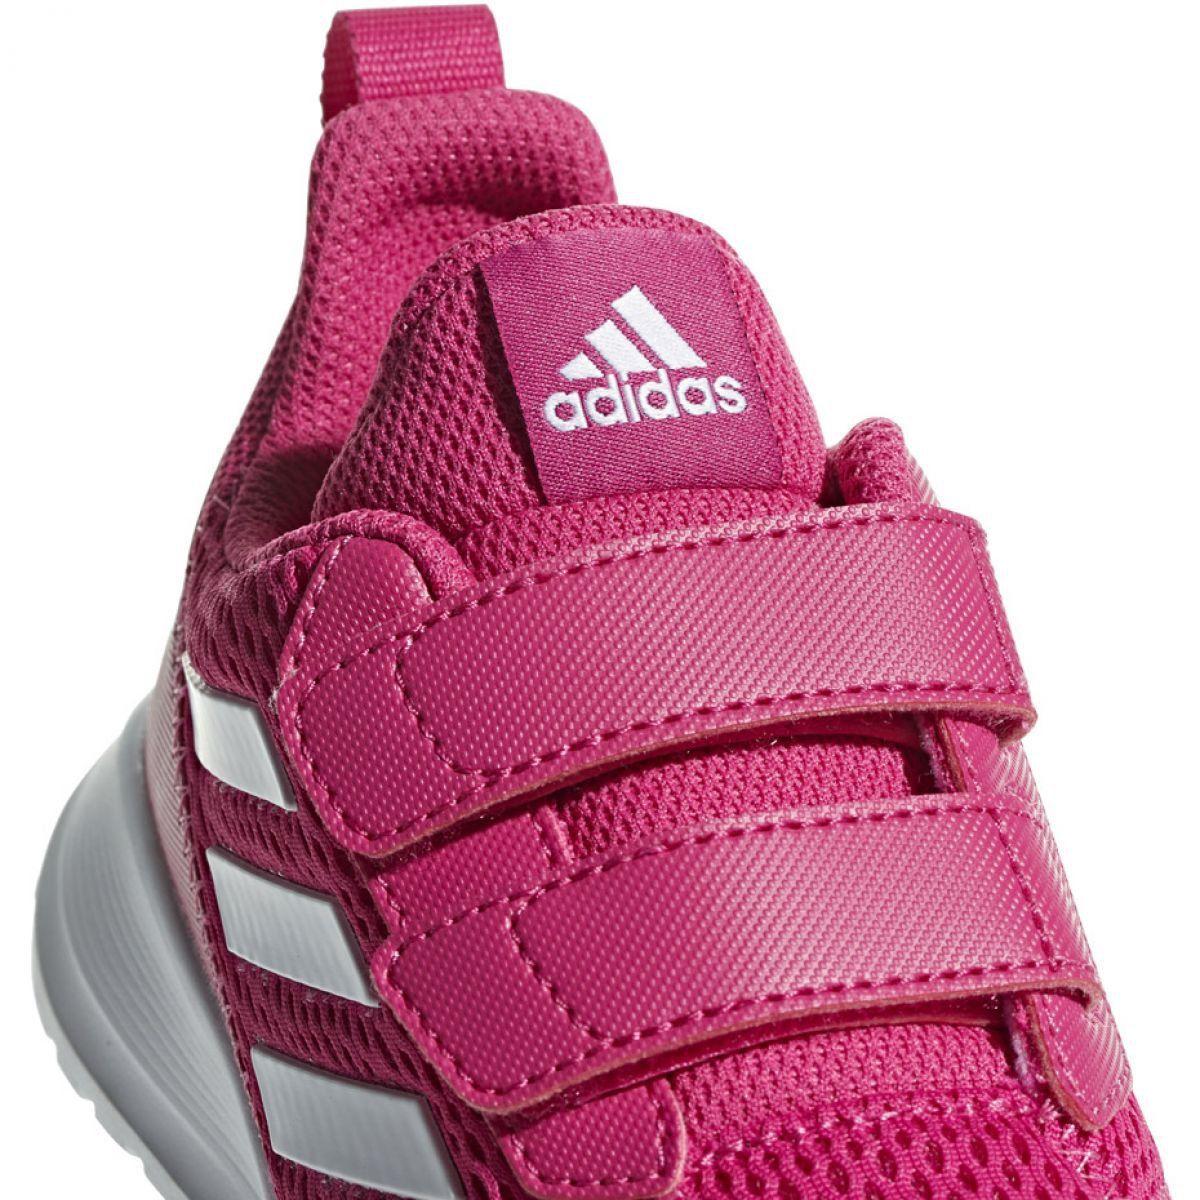 Buty Adidas Altarun Cf K Jr Cg6895 Rozowe Sports Shoes Adidas Kid Shoes Shoes